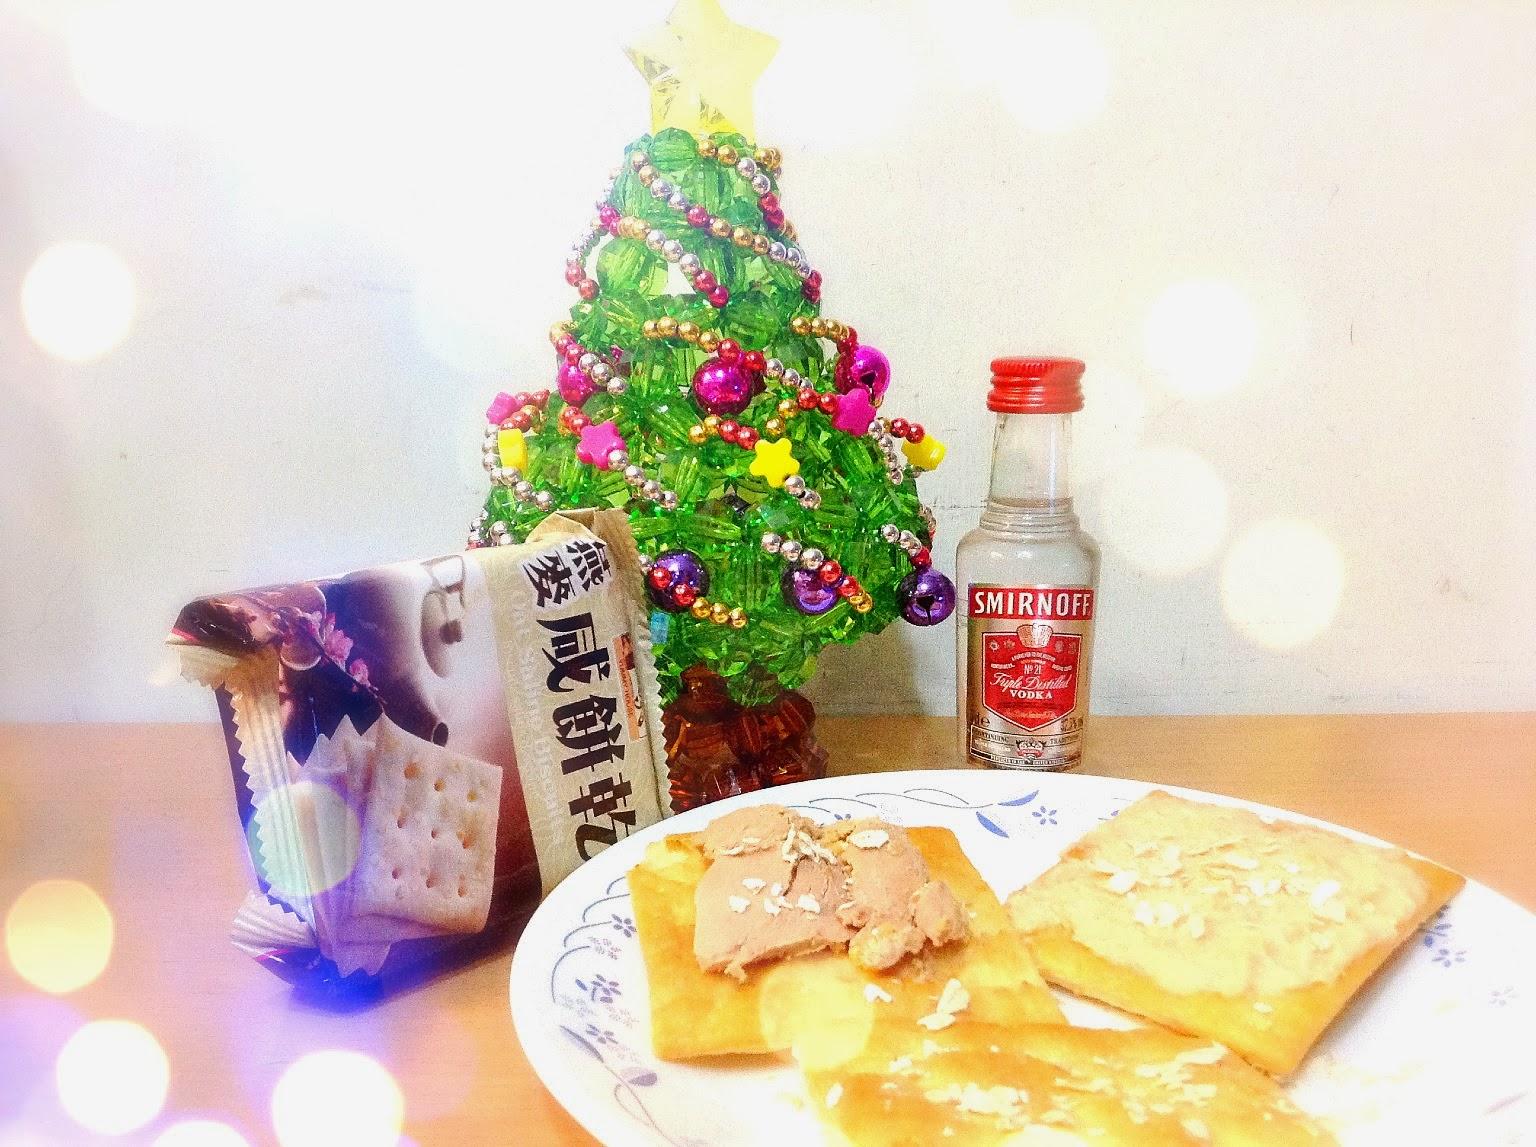 >> 自製聖誕Party小吃*美味棧咸餅乾 Yummy House Saline Biscuits